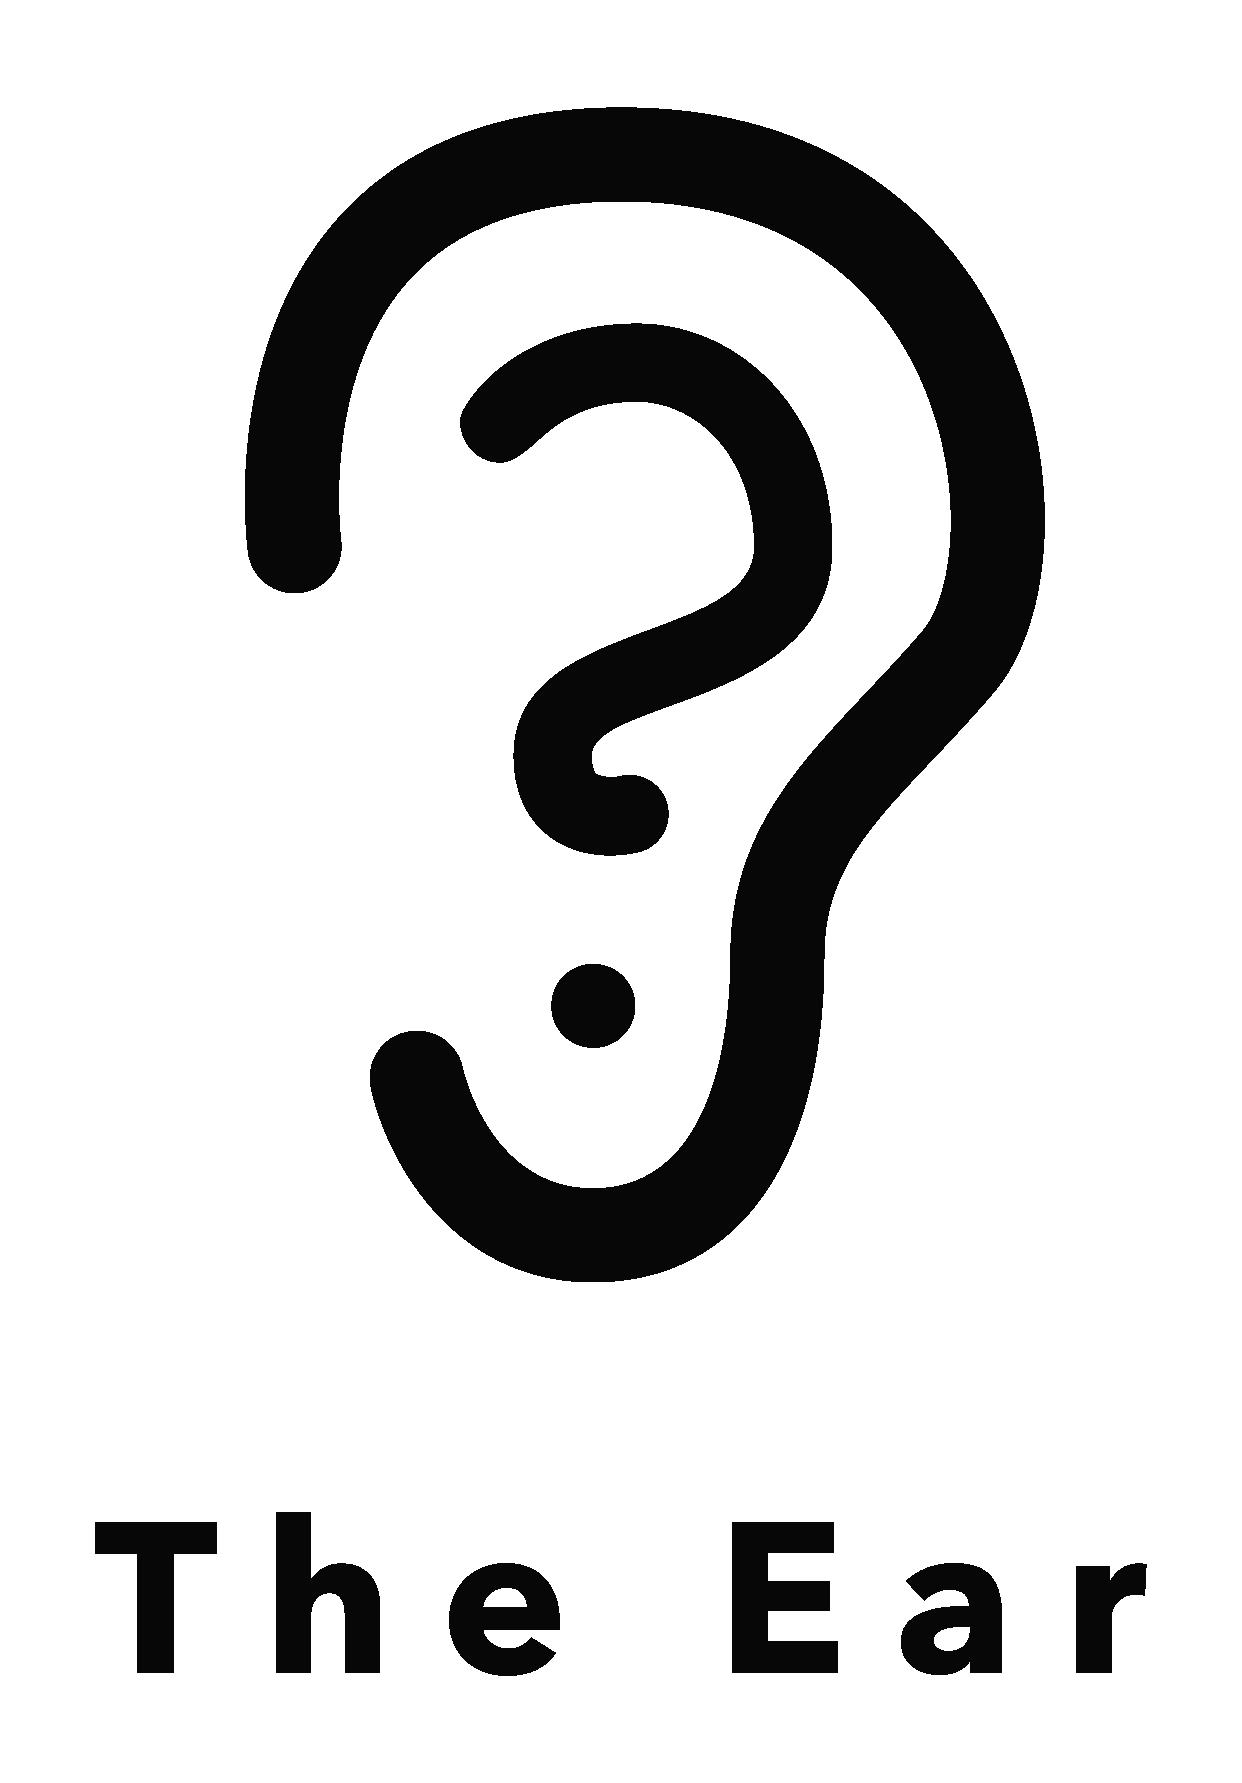 the ear podcast identity system logo full black